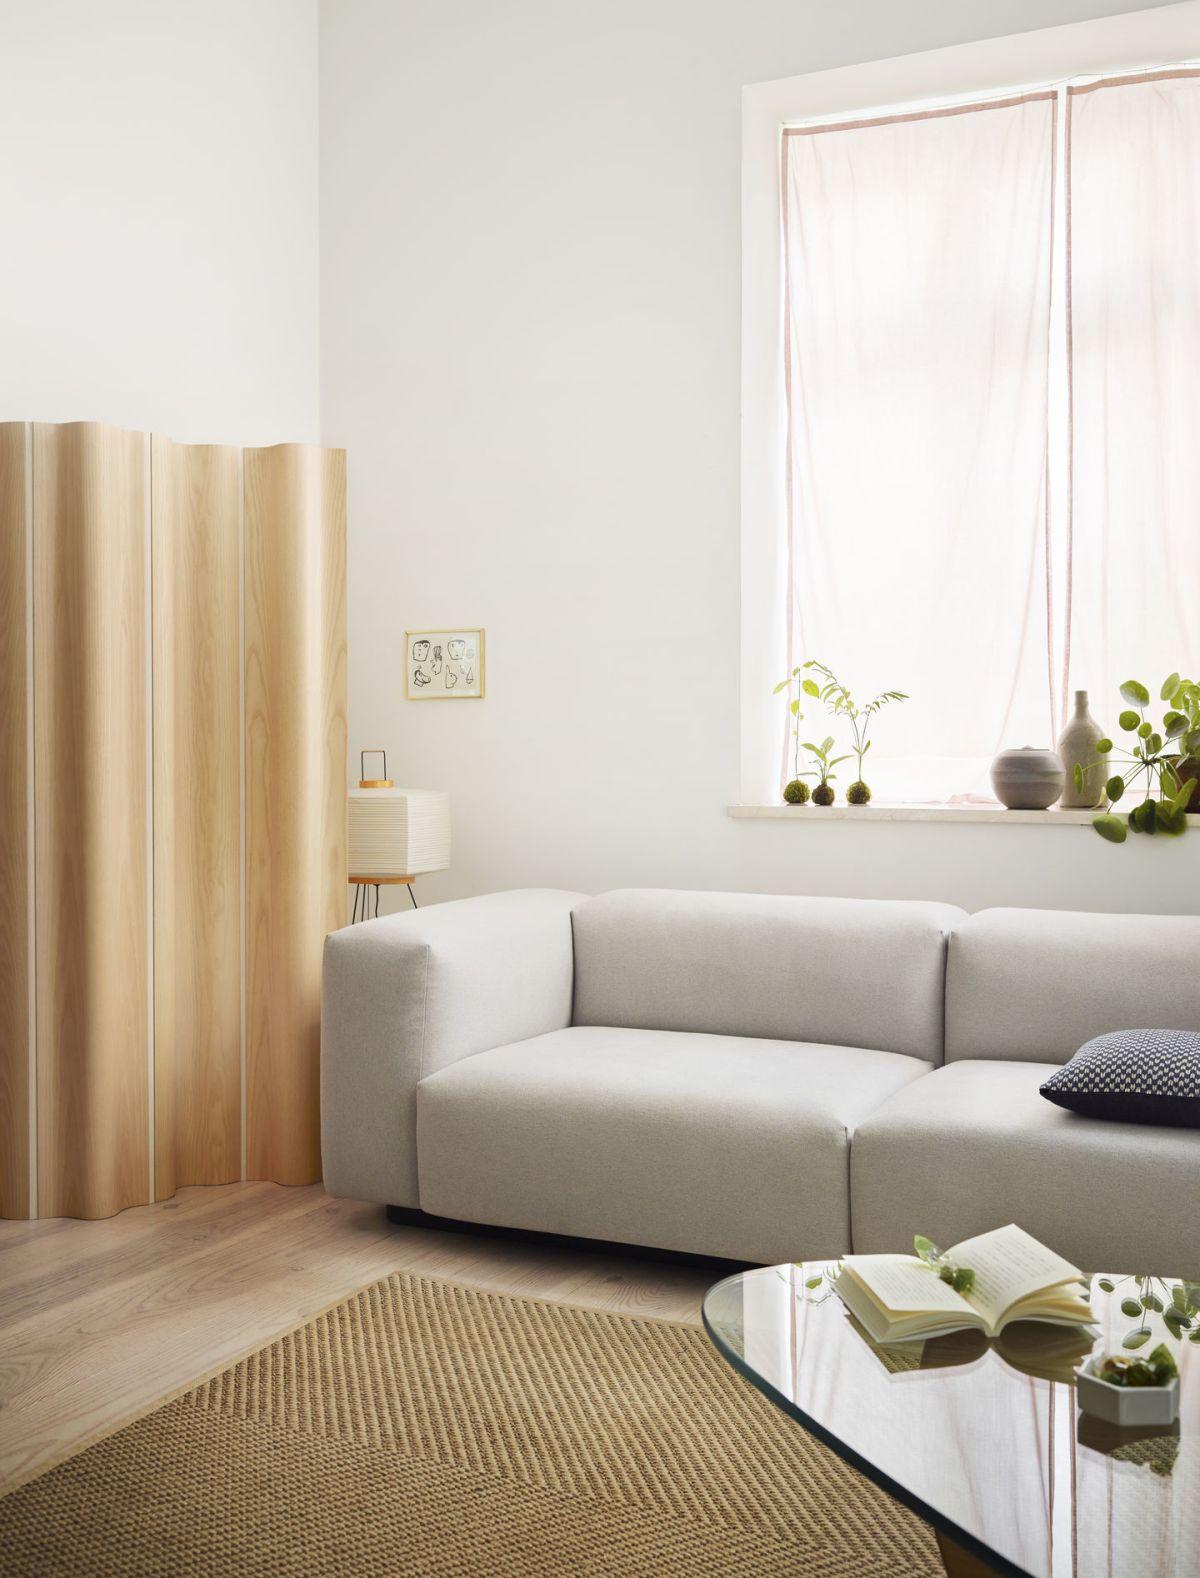 2576556_Soft-Modular-Sofa-Noguchi-Coffee-Table-Eames-Folding-Screen-Akari-Hexagonal-Containers_v_fullbleed_1440x